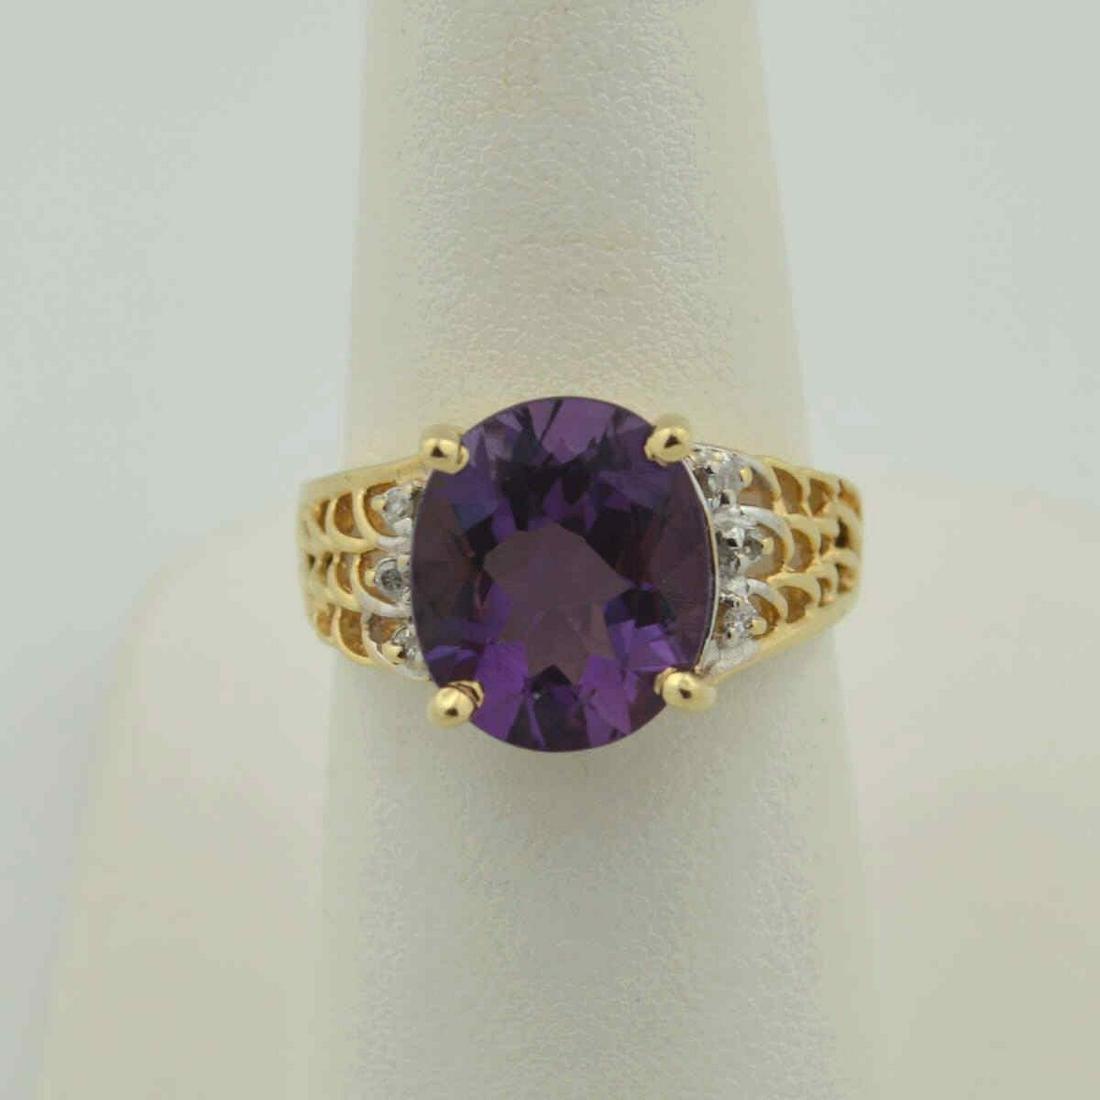 14kt yellow gold amethyst ring